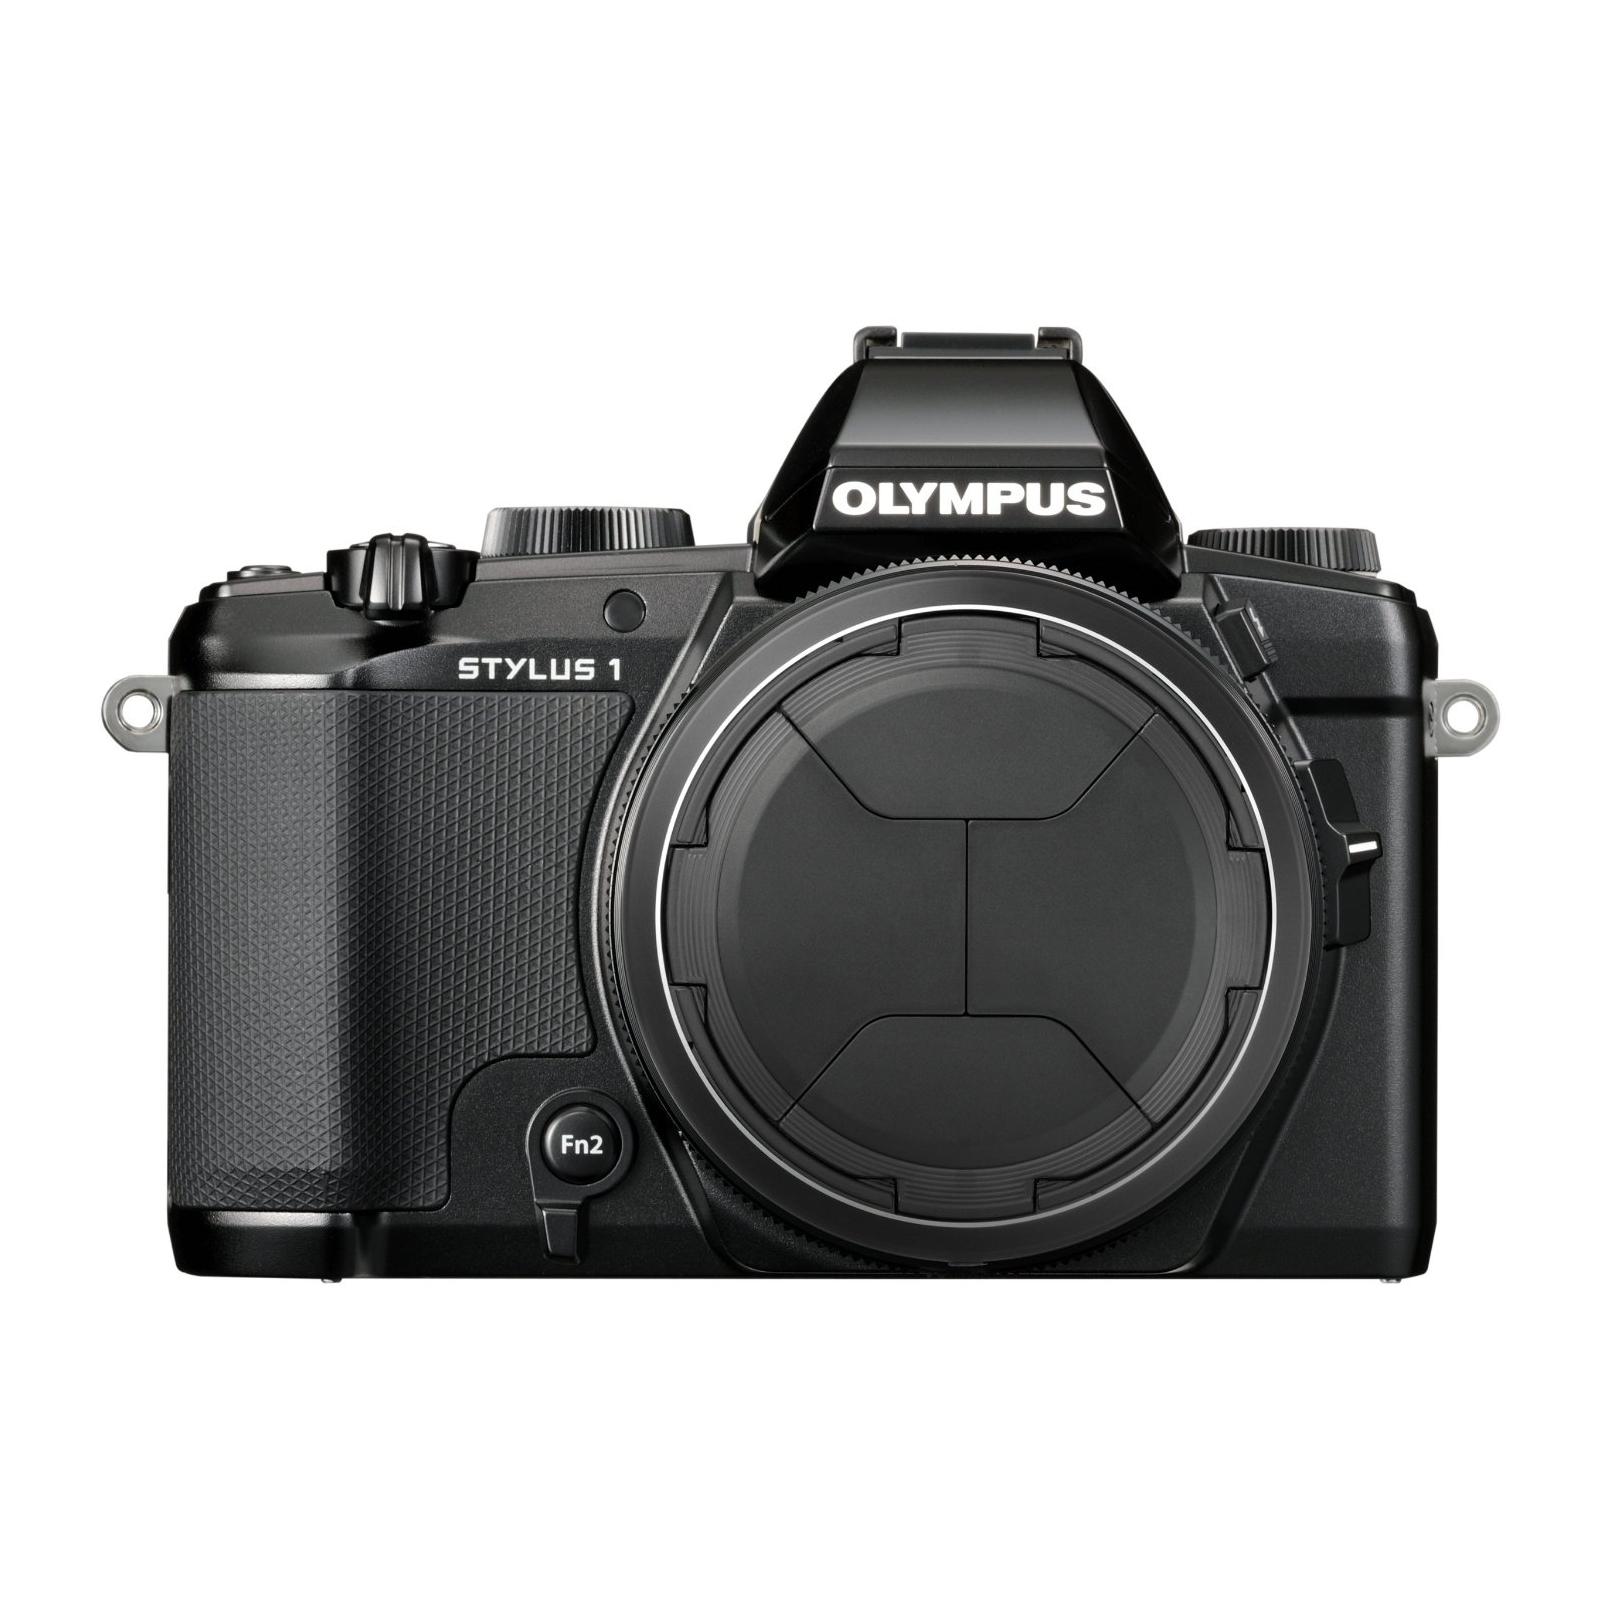 Цифровой фотоаппарат OLYMPUS STYLUS 1 Black (V109010BE000) изображение 3